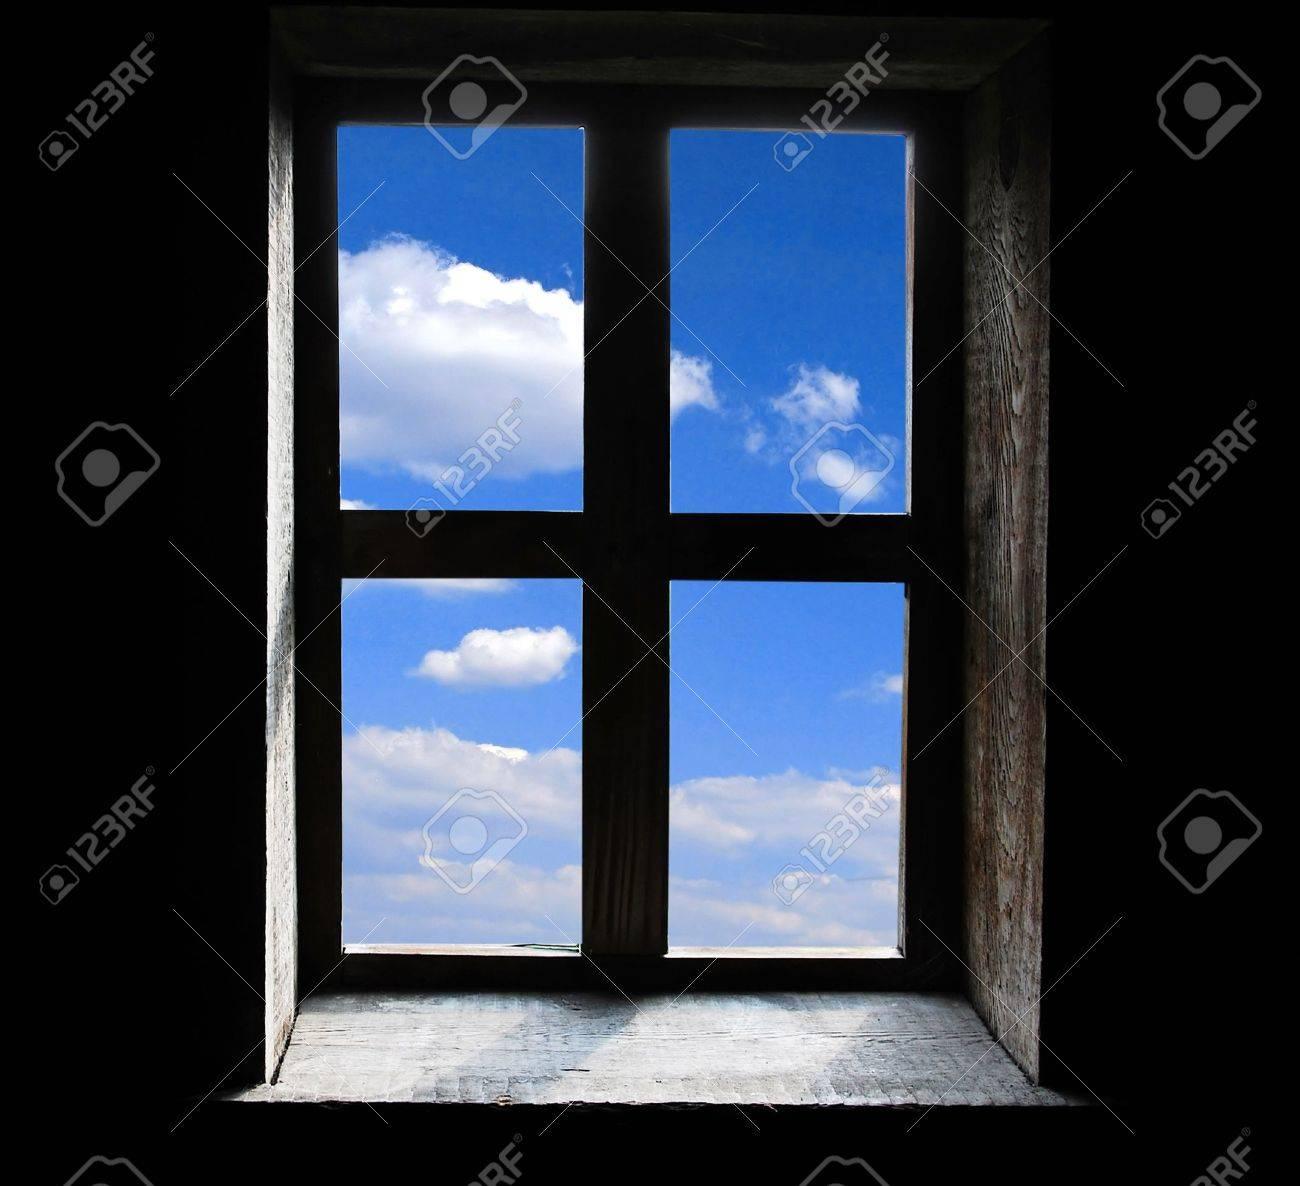 Window on black background Stock Photo - 9994991